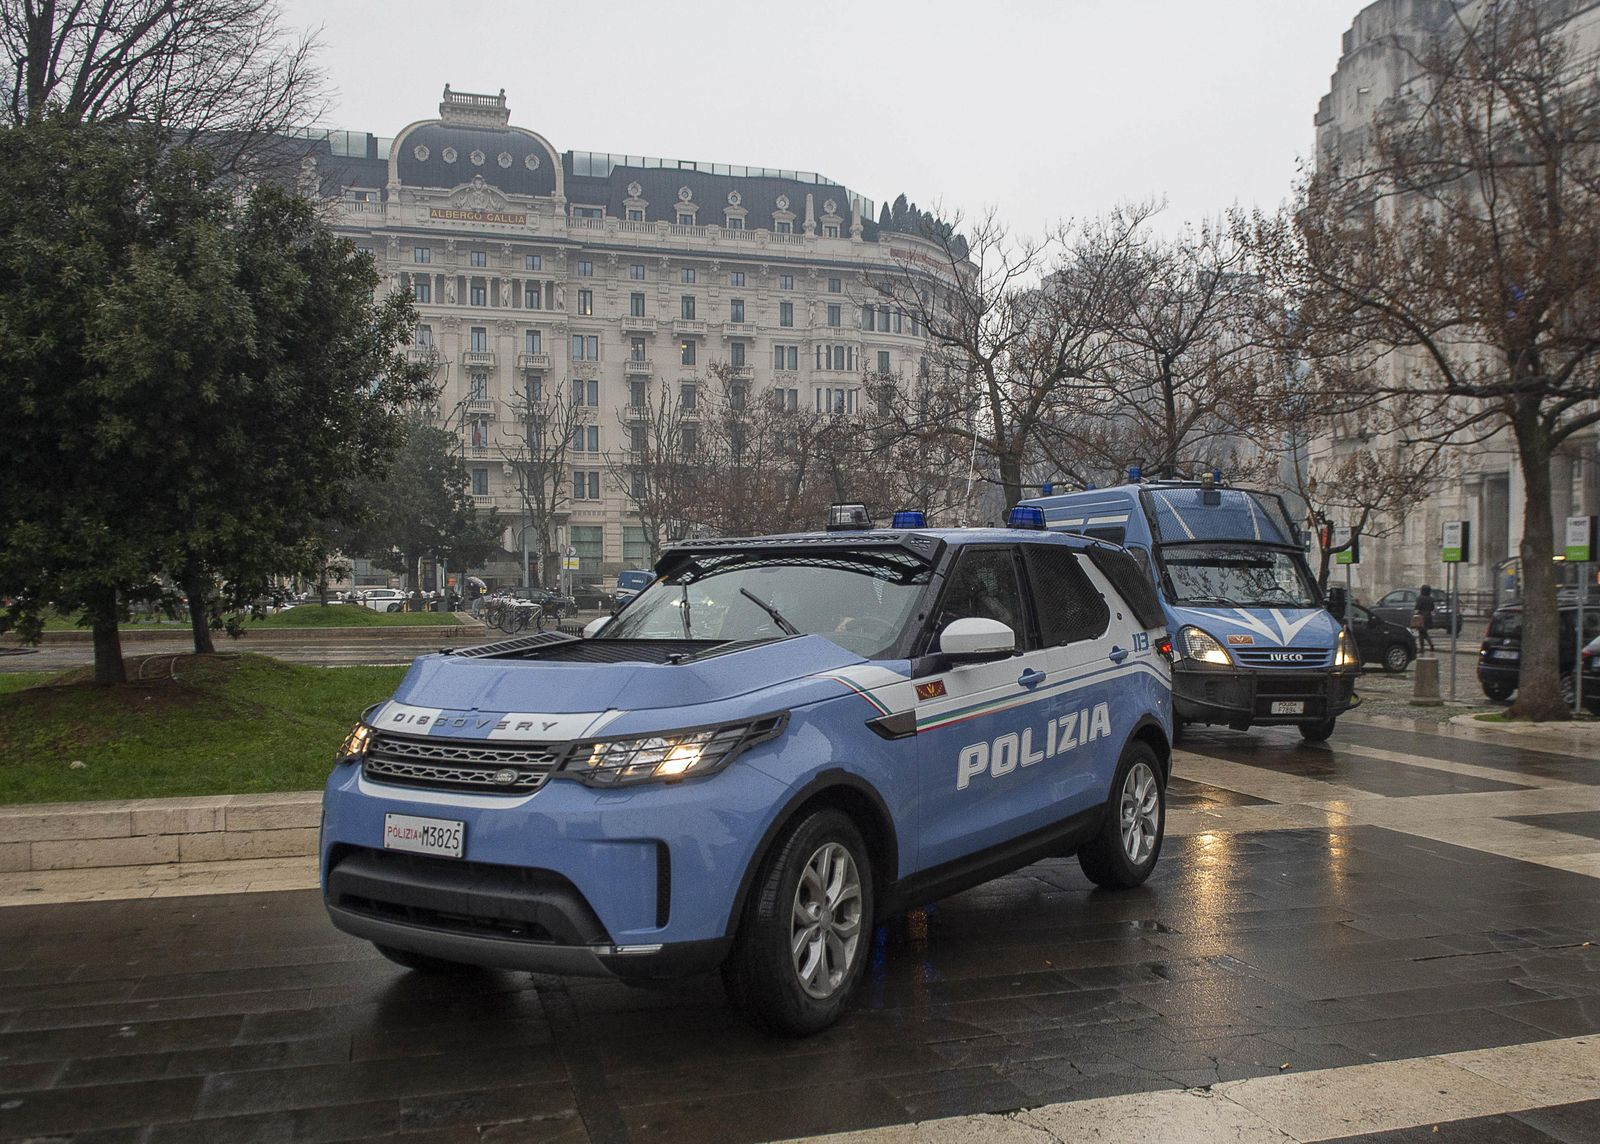 Police controls in Milan during lockdown, Milano, Italy - 20 Jan 2021